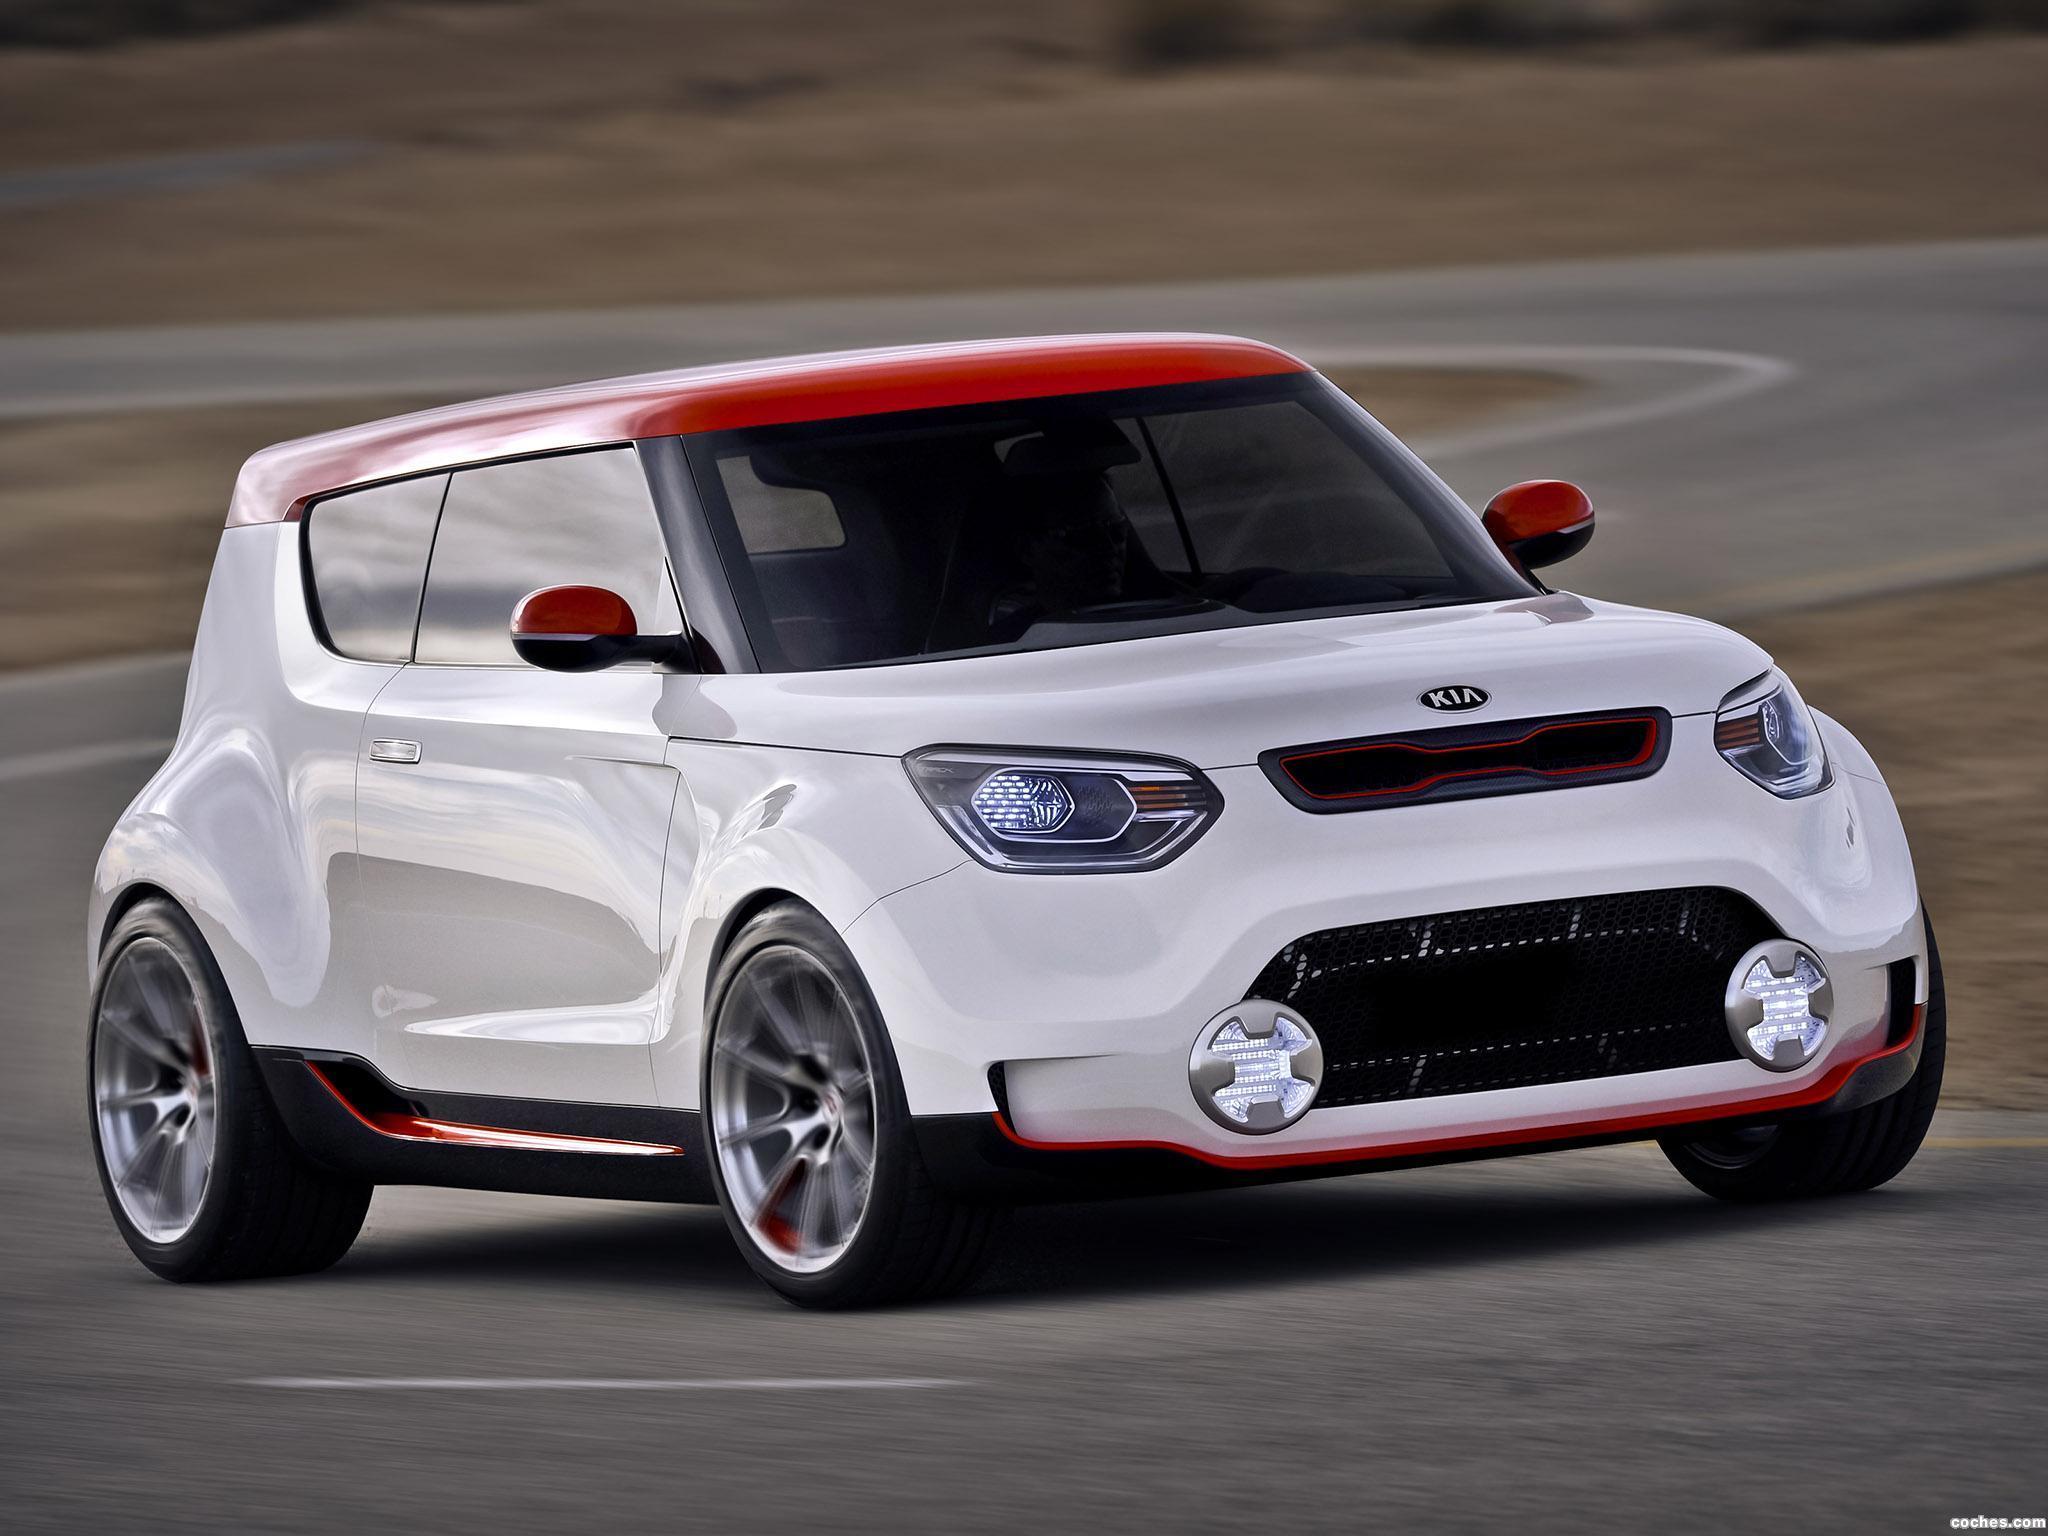 Foto 0 de Kia Trackster Concept 2012